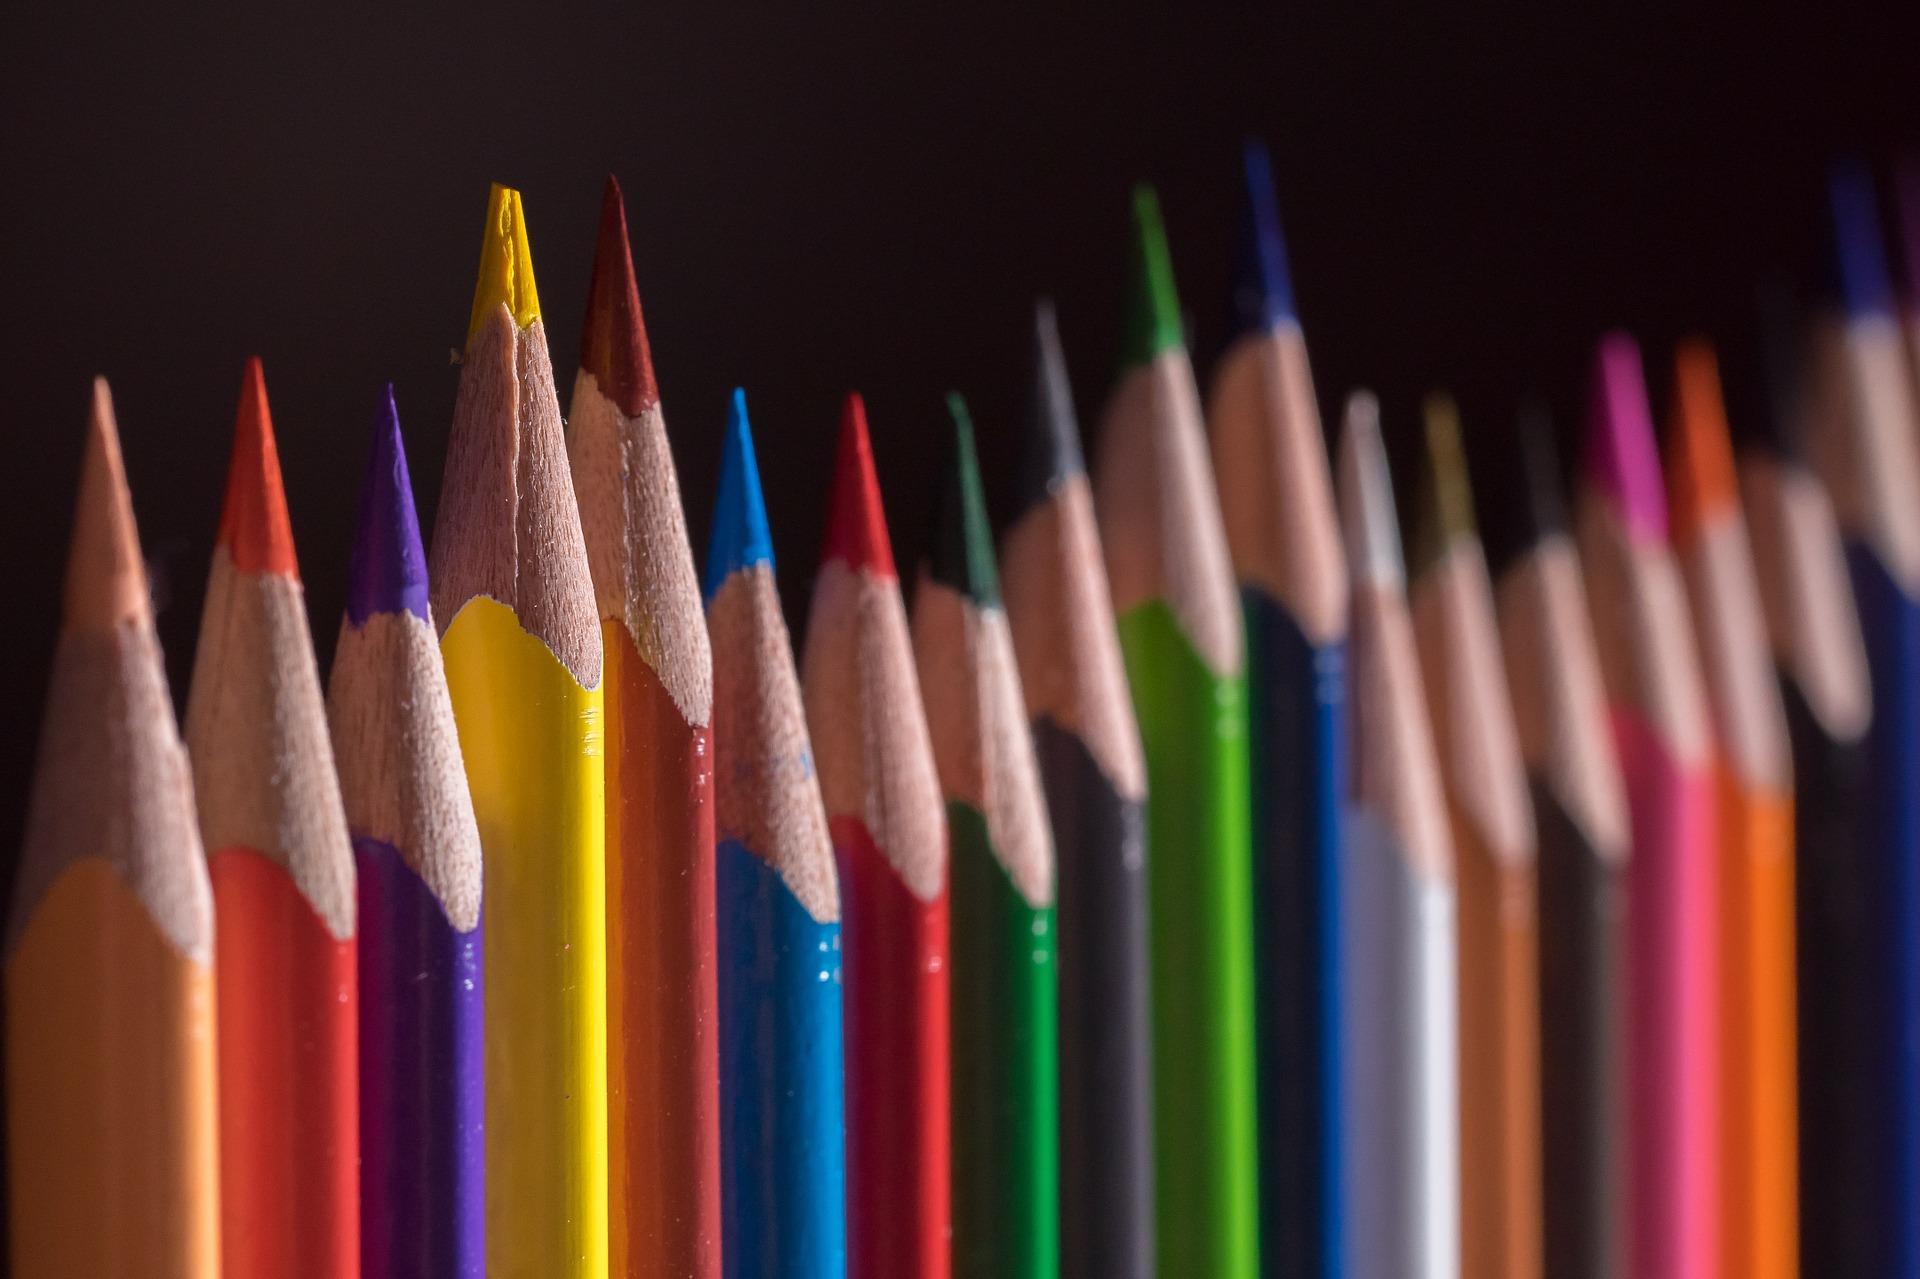 colored-pencils-656178_1920